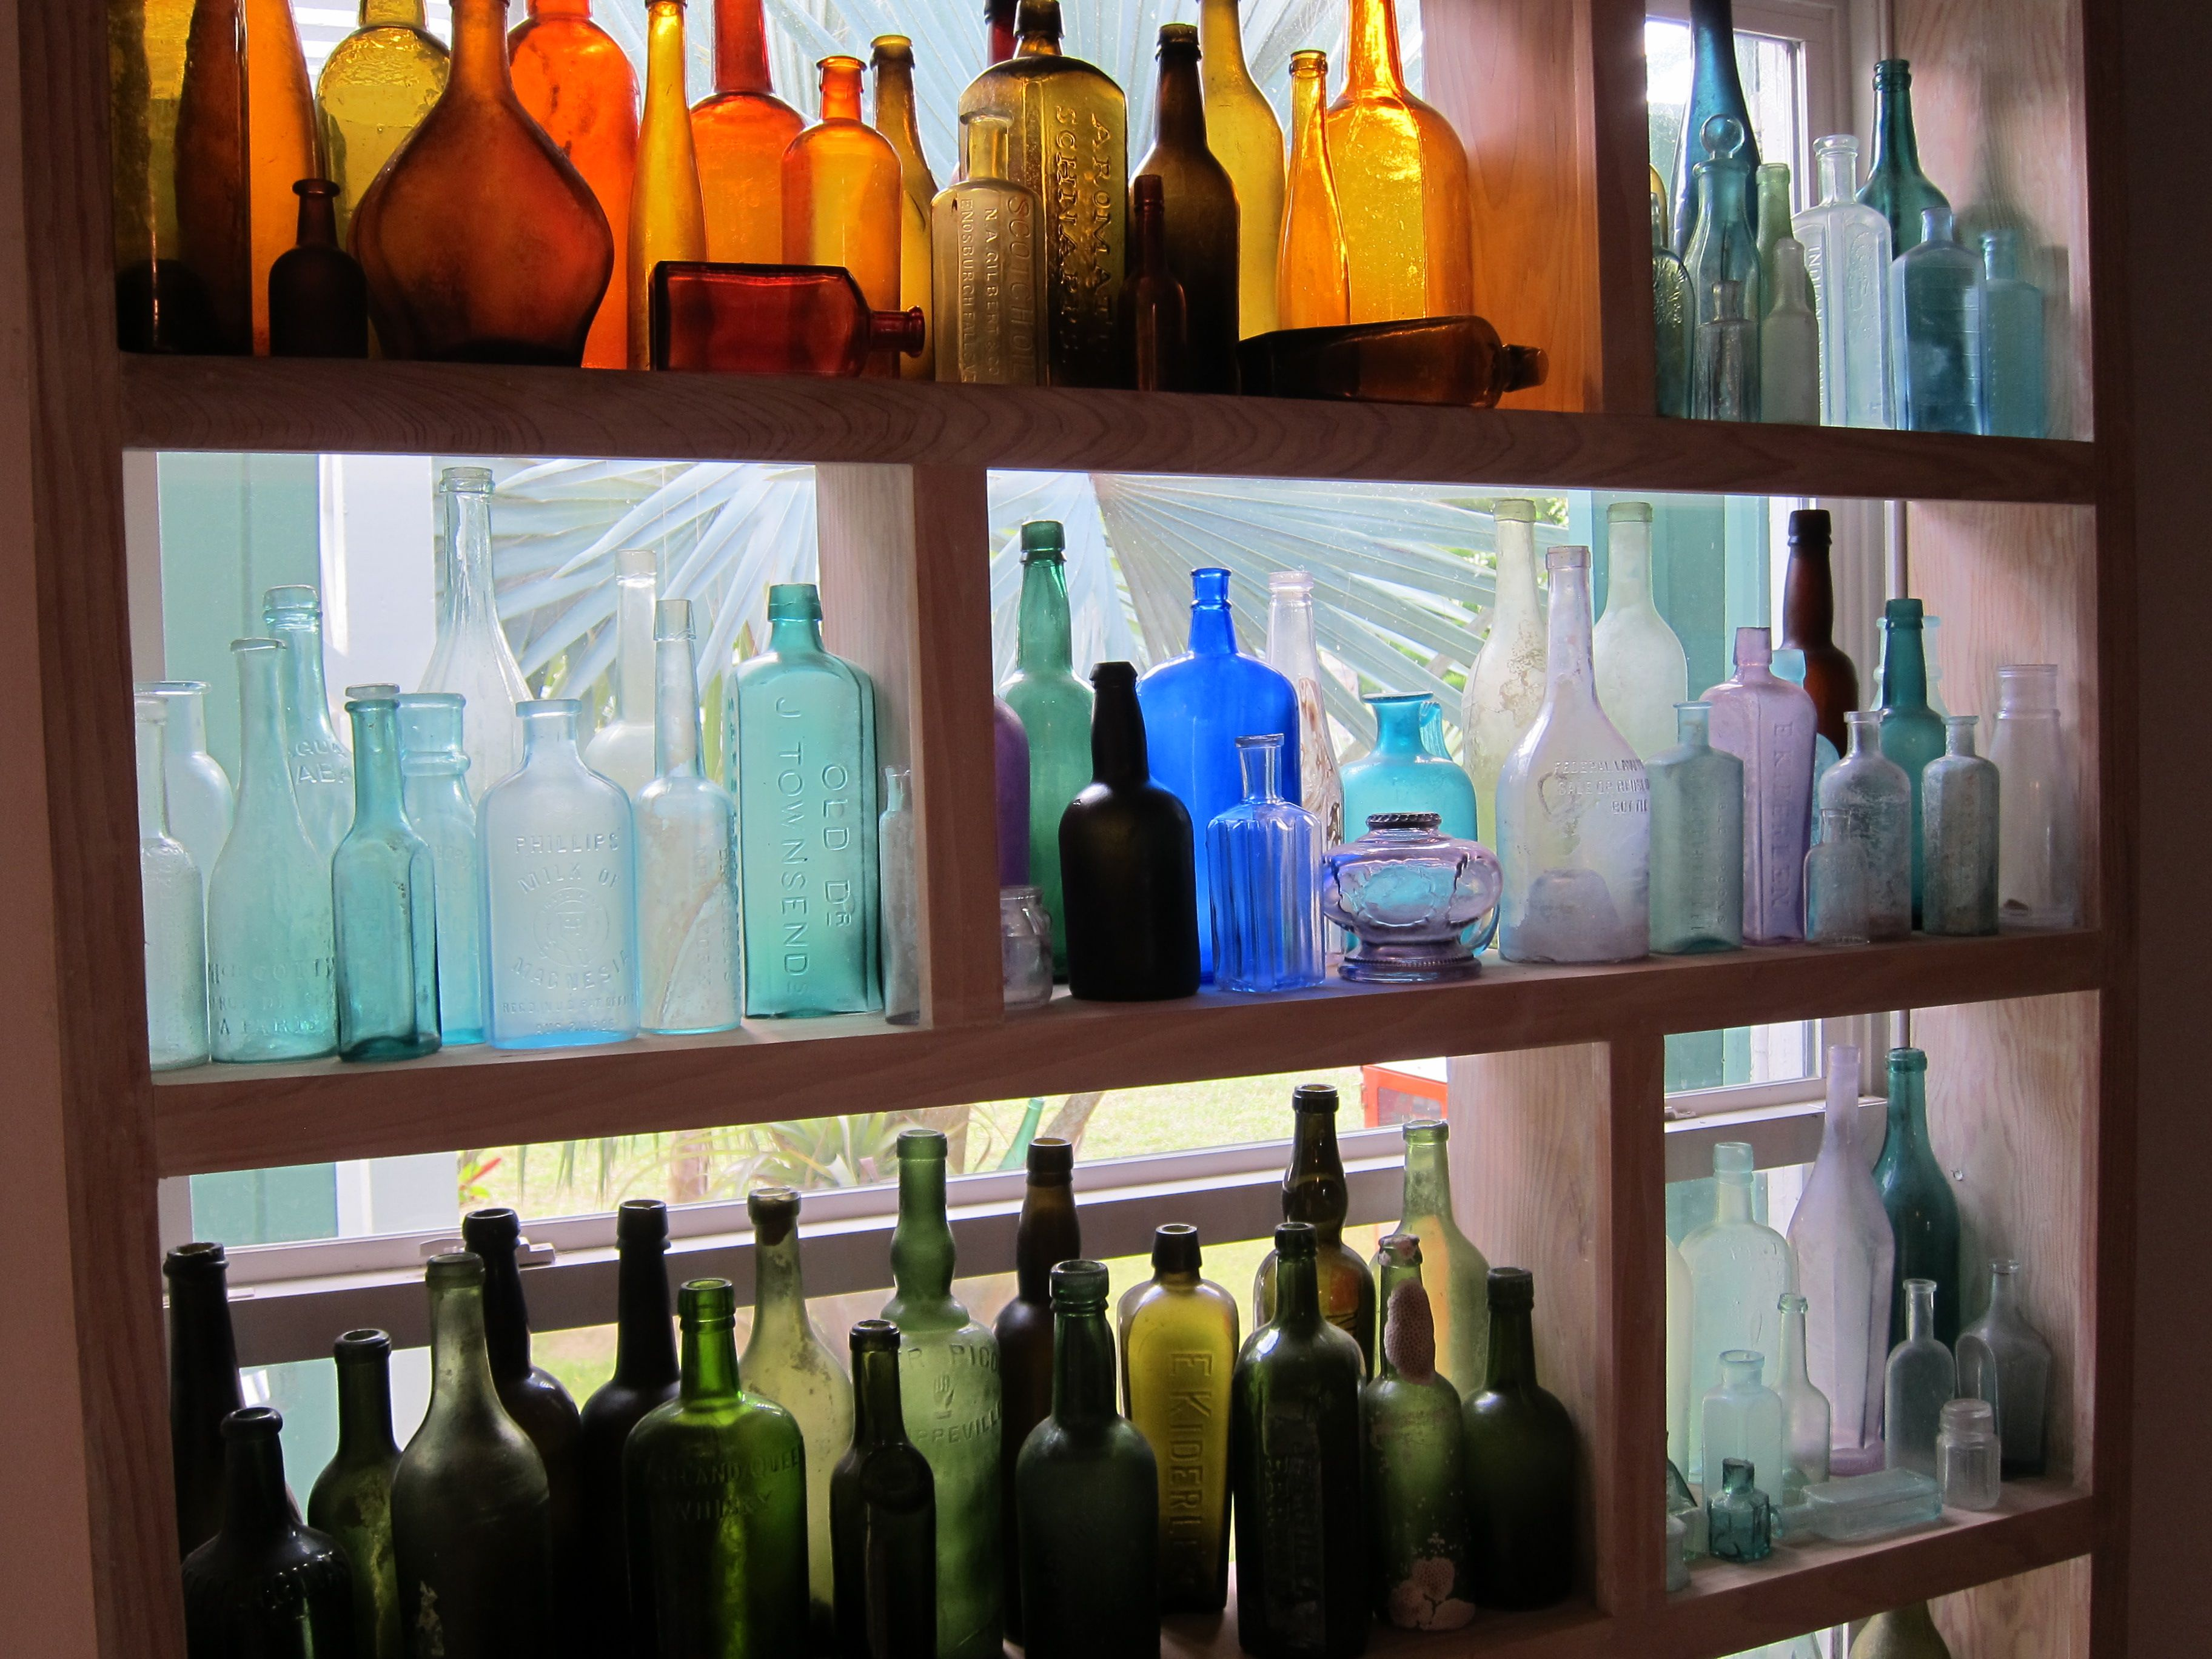 Best 25 Window shelves ideas on Pinterest  Plant window shelf Kitchen window shelves and